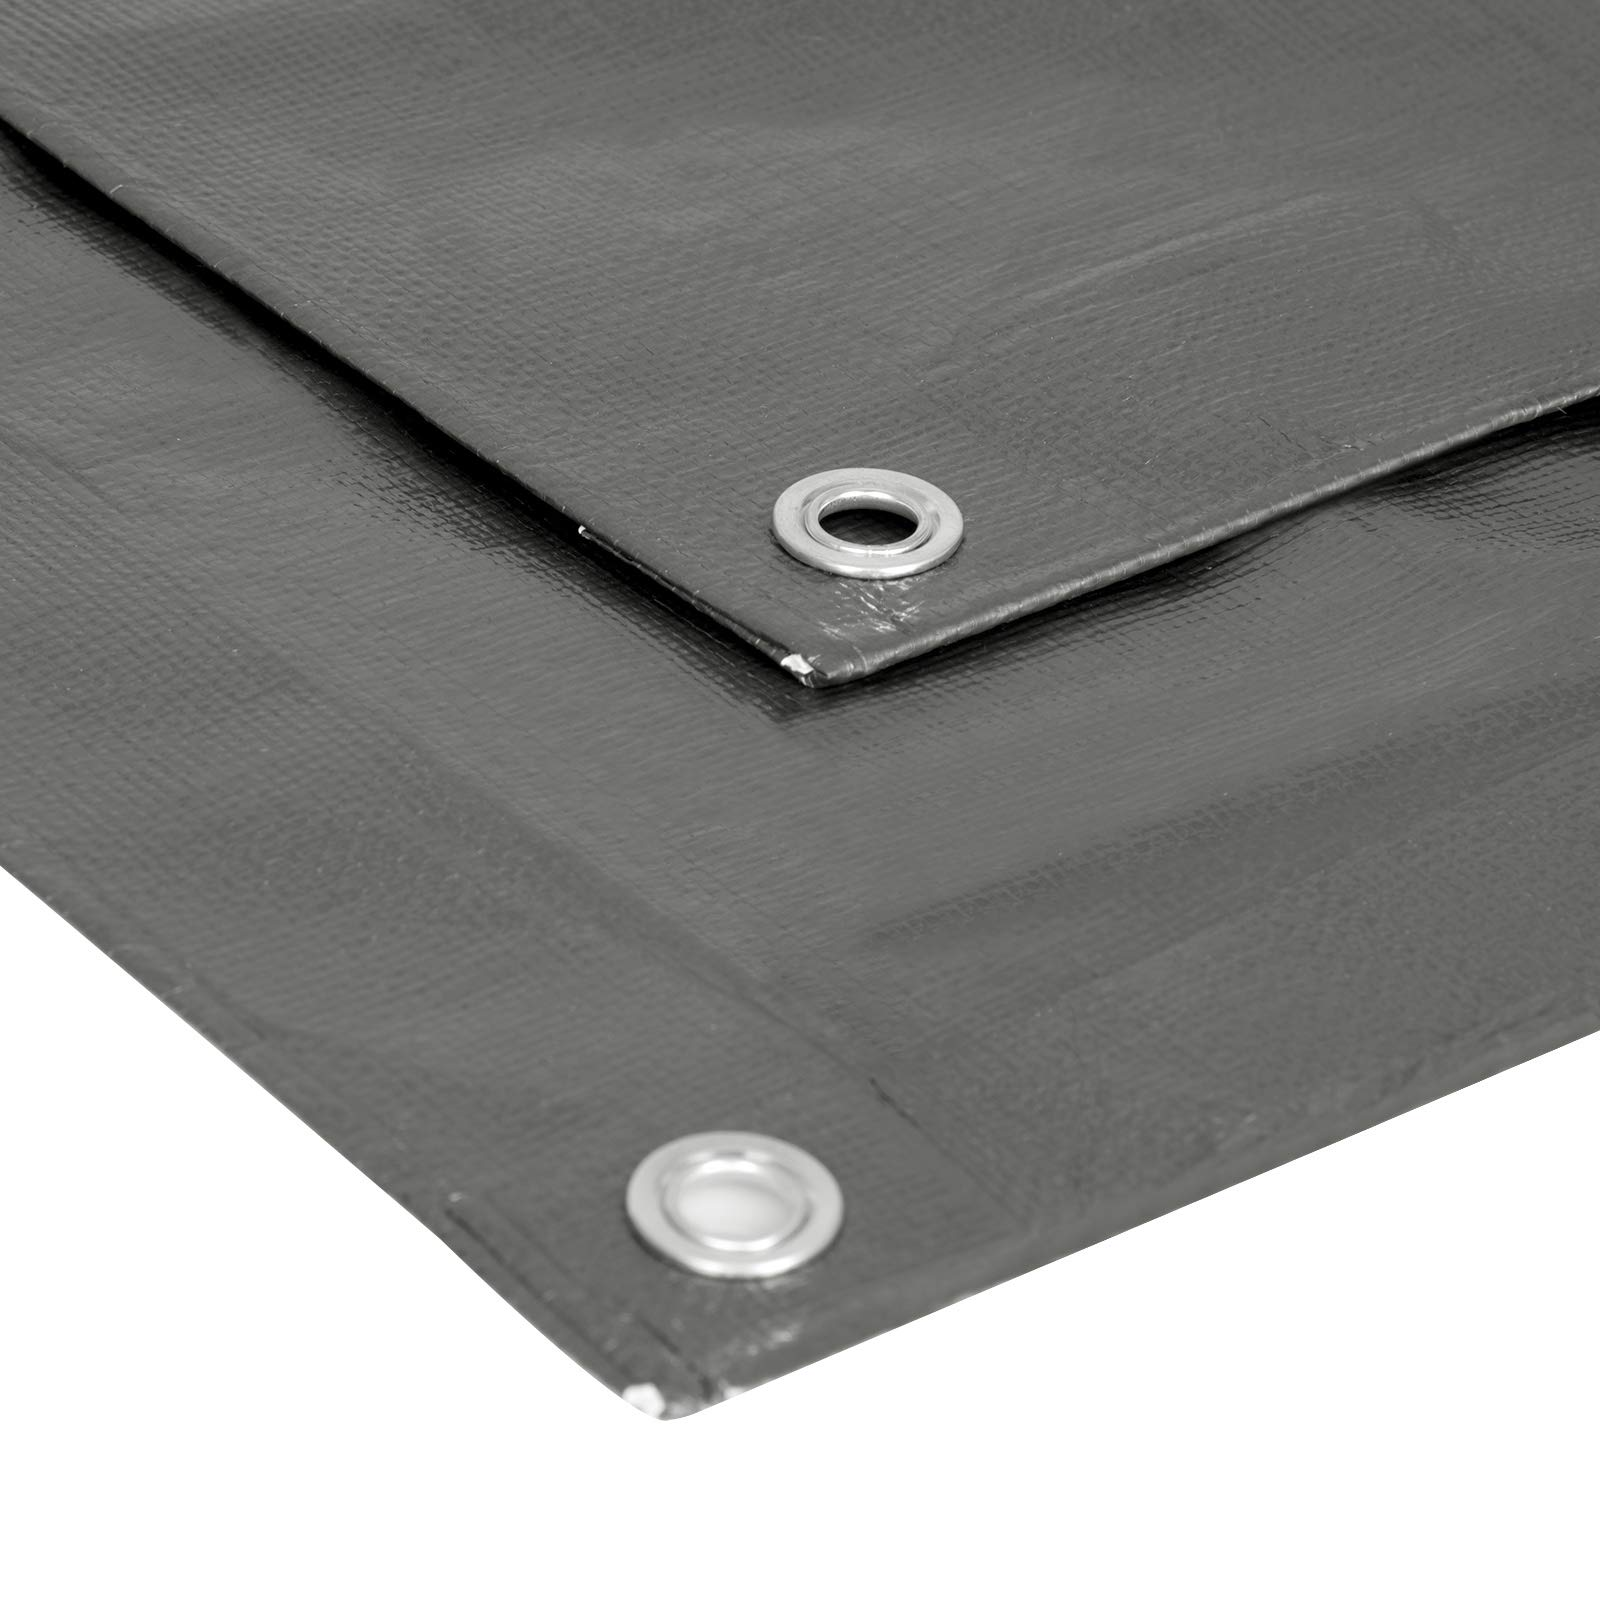 piscina lona de protecci/ón con ojales para muebles de jard/ín + cuerda de 10 m lona de protecci/ón impermeable y resistente a la rotura 120 g//m2 lona impermeable exterior 2 x 2 m CoverUp camiones